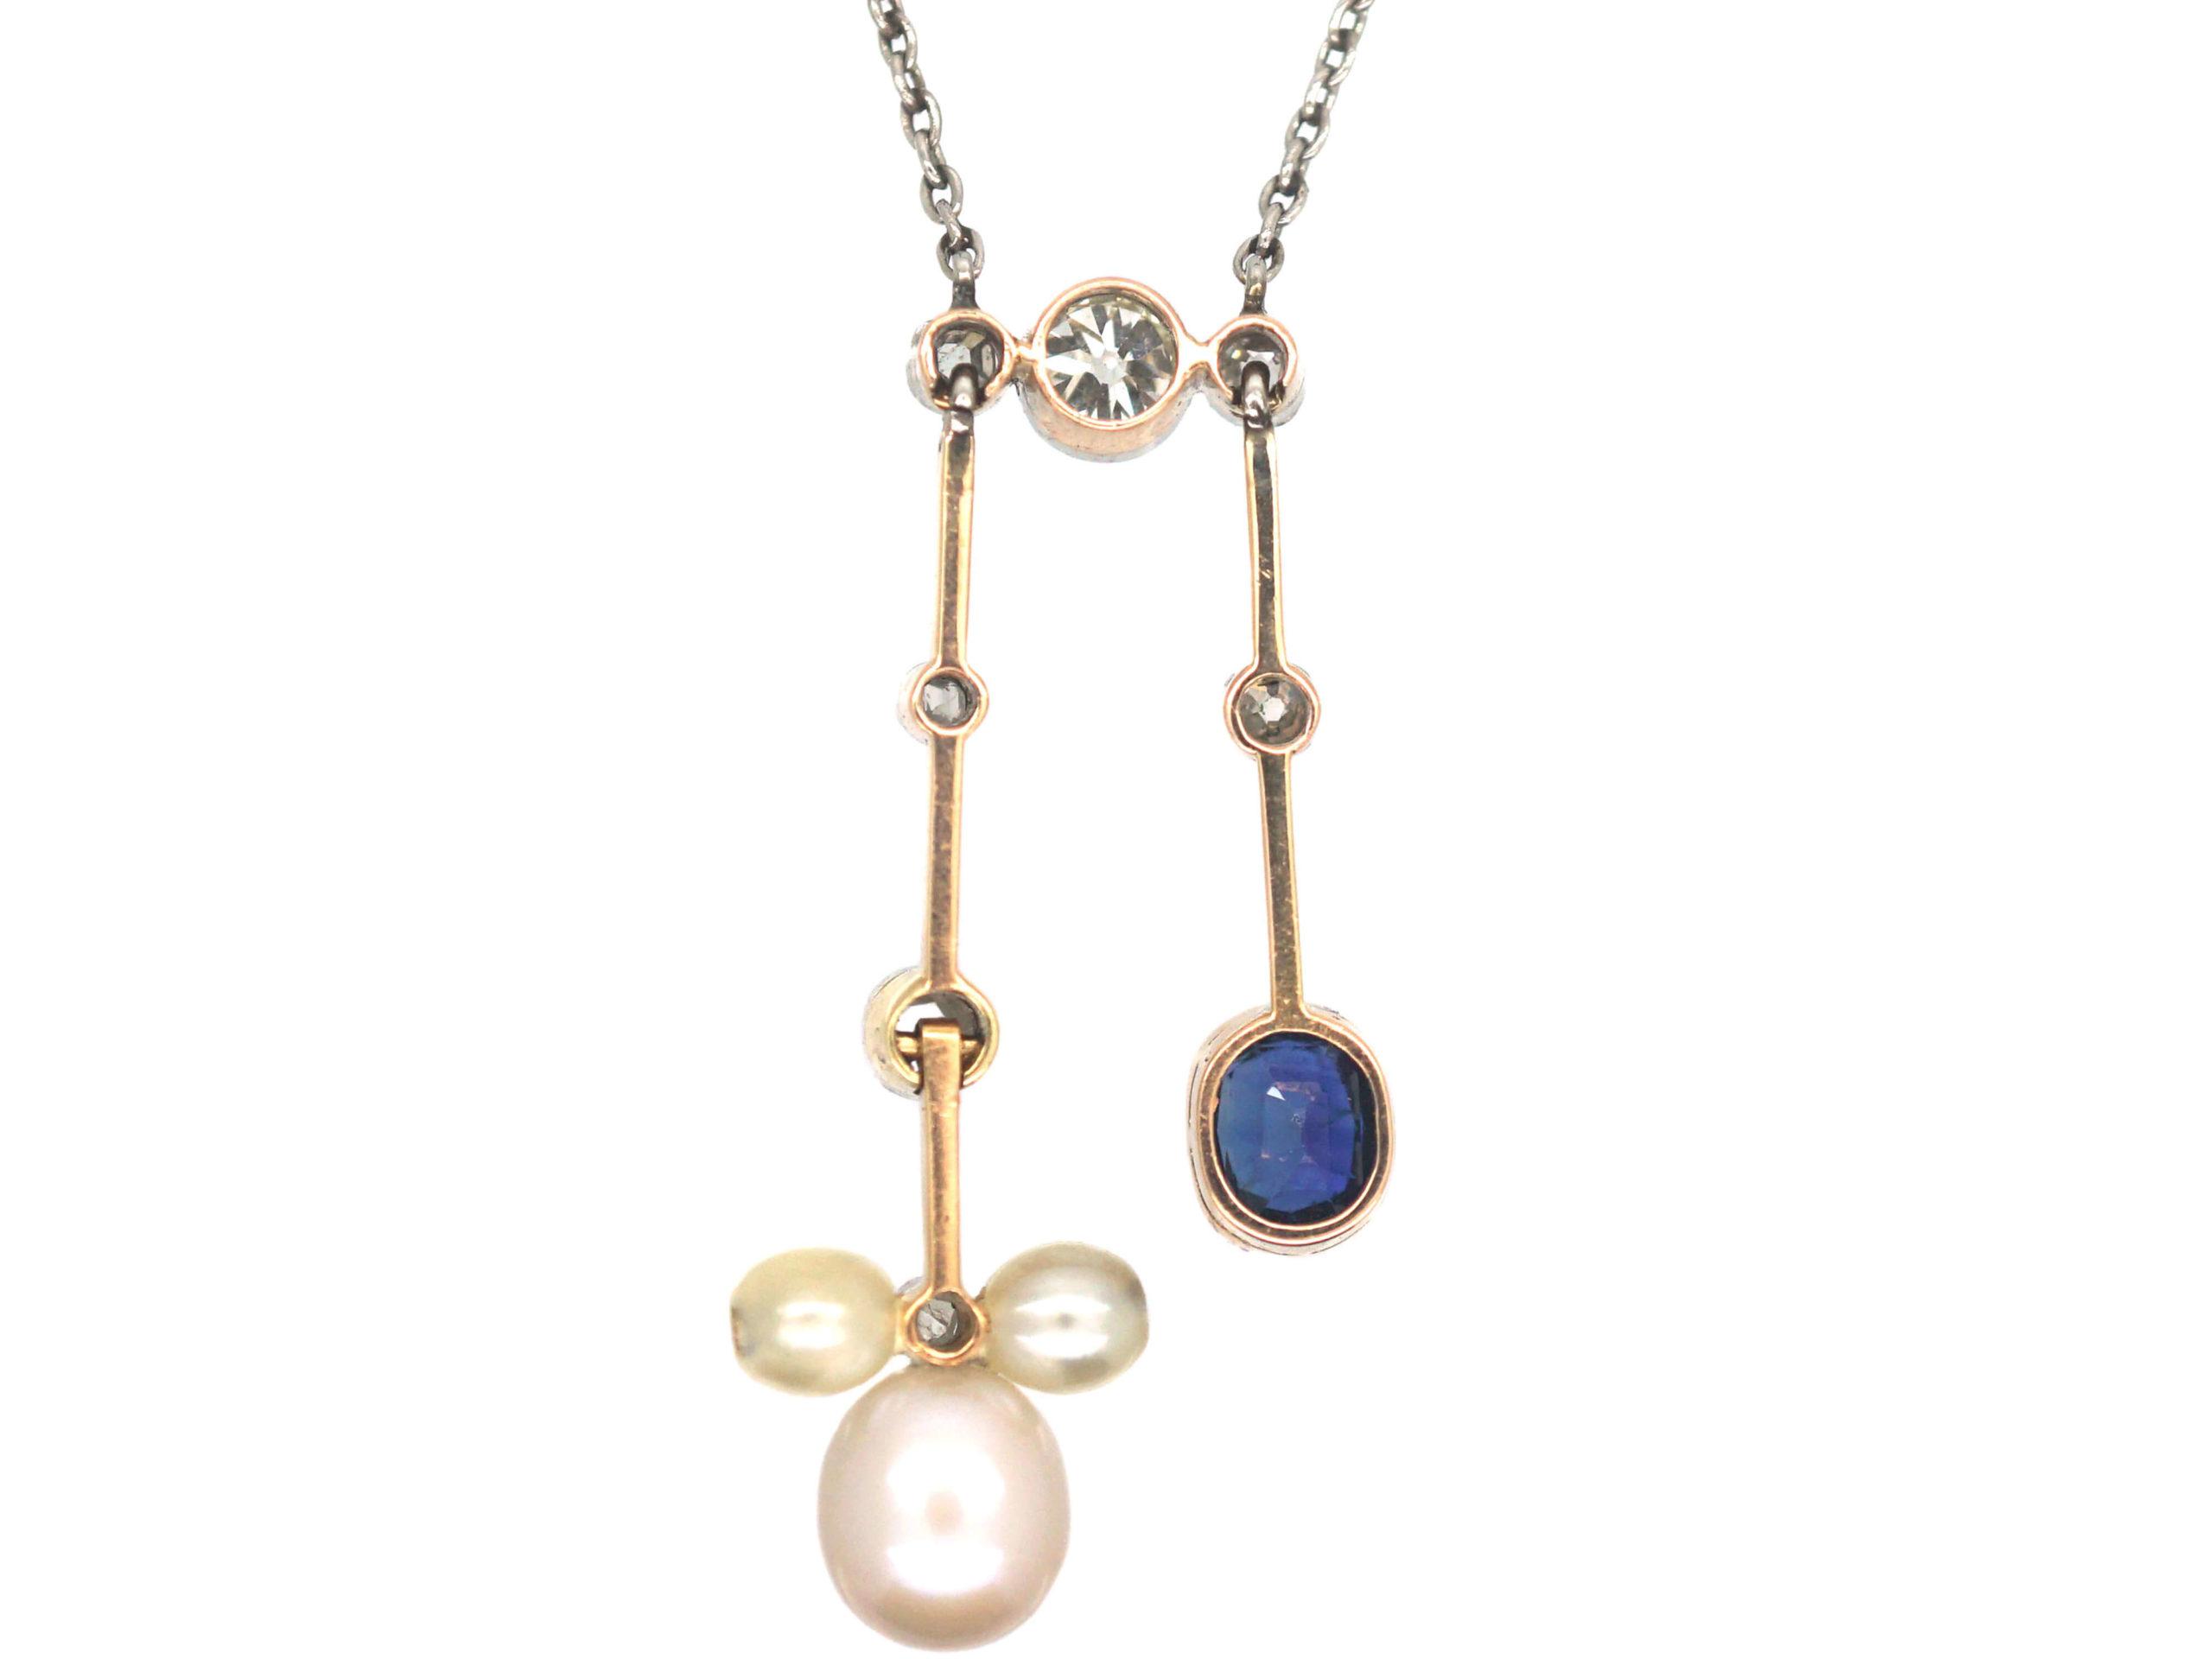 Art Deco 18ct Gold & Platinum, Sapphire, Diamond & Natural Pendant Negligee Pendant